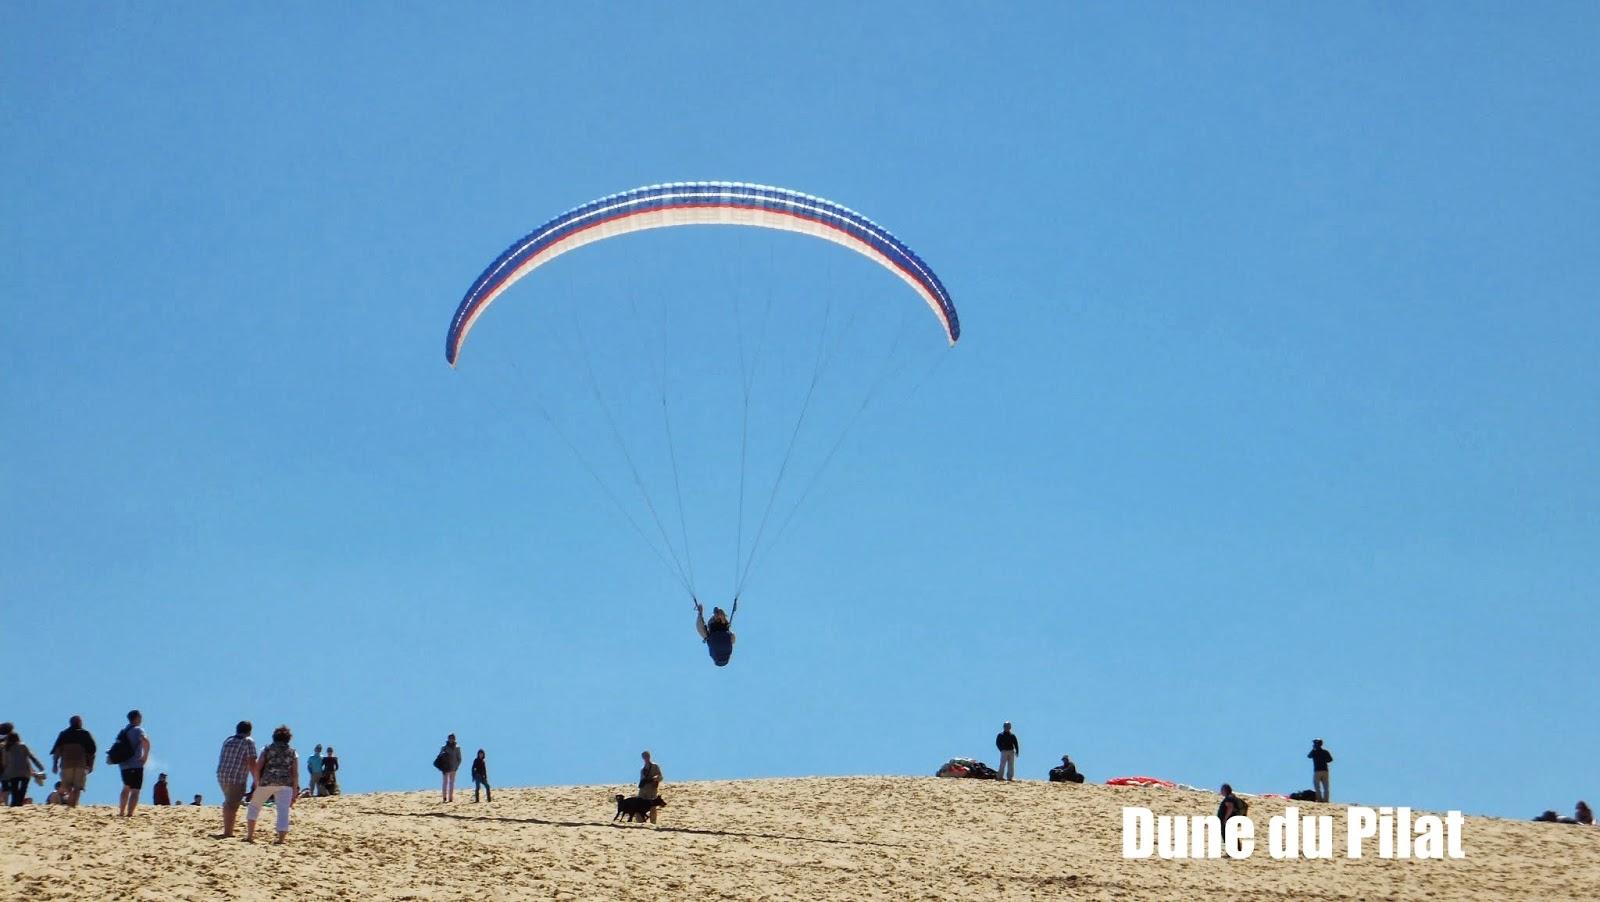 Gran Duna de Pilat, Arcachon, Francia, Elisa N, Blog de Viajes, Lifestyle, Travel